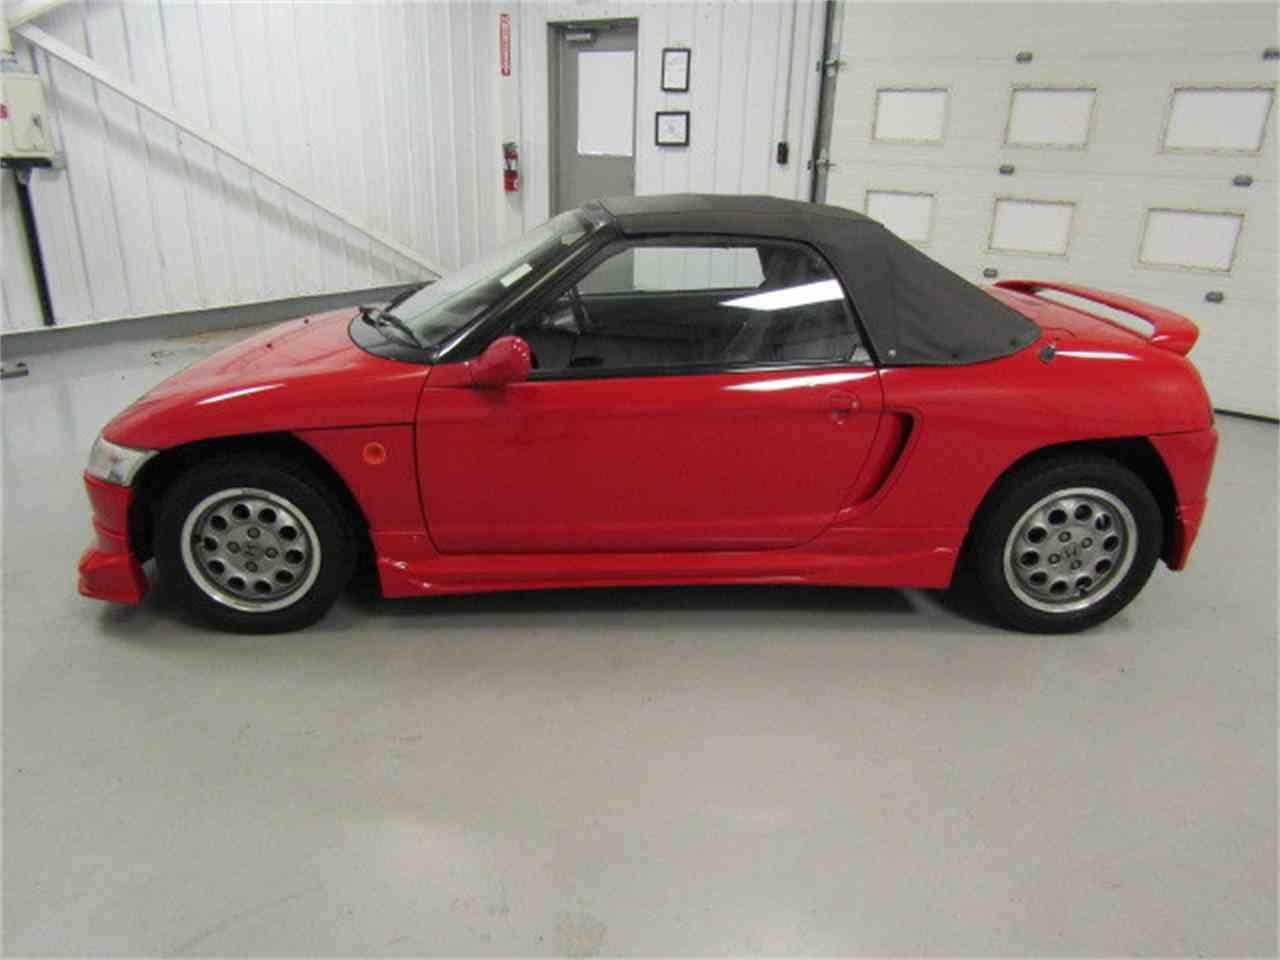 Large Picture of 1991 Honda Beat located in Christiansburg Virginia - $6,999.00 - JL83